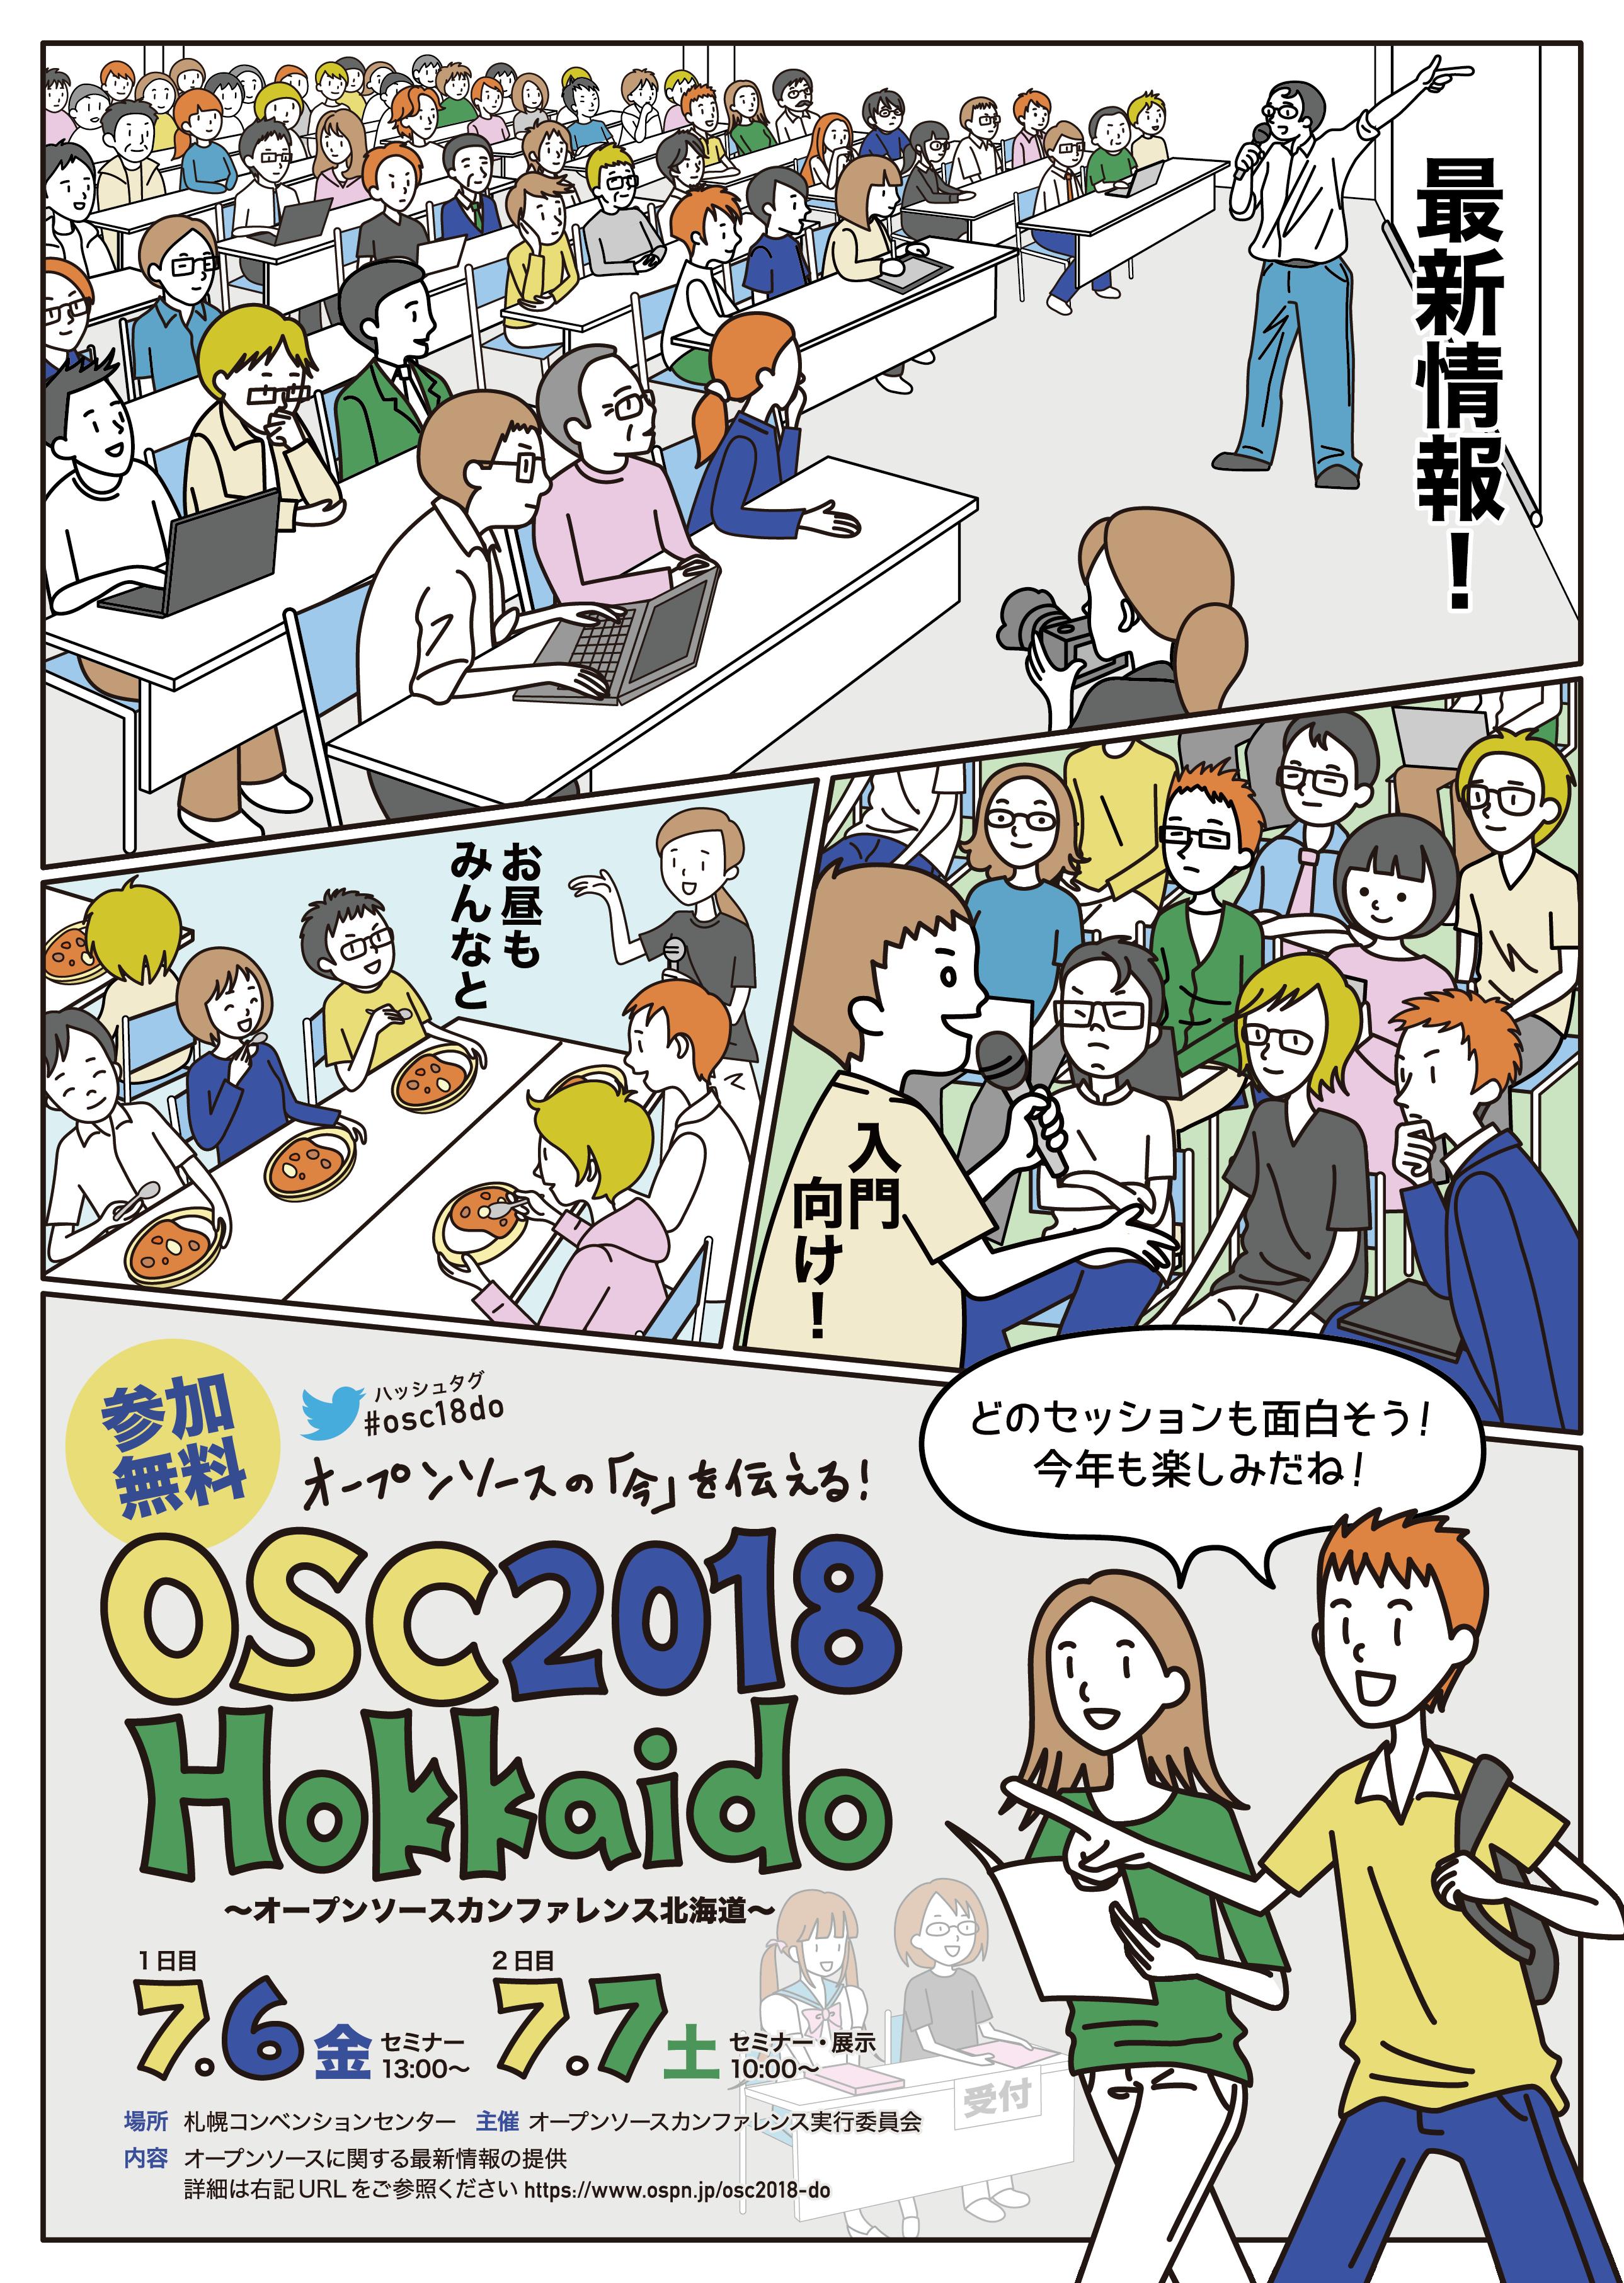 OSC18do ポスター